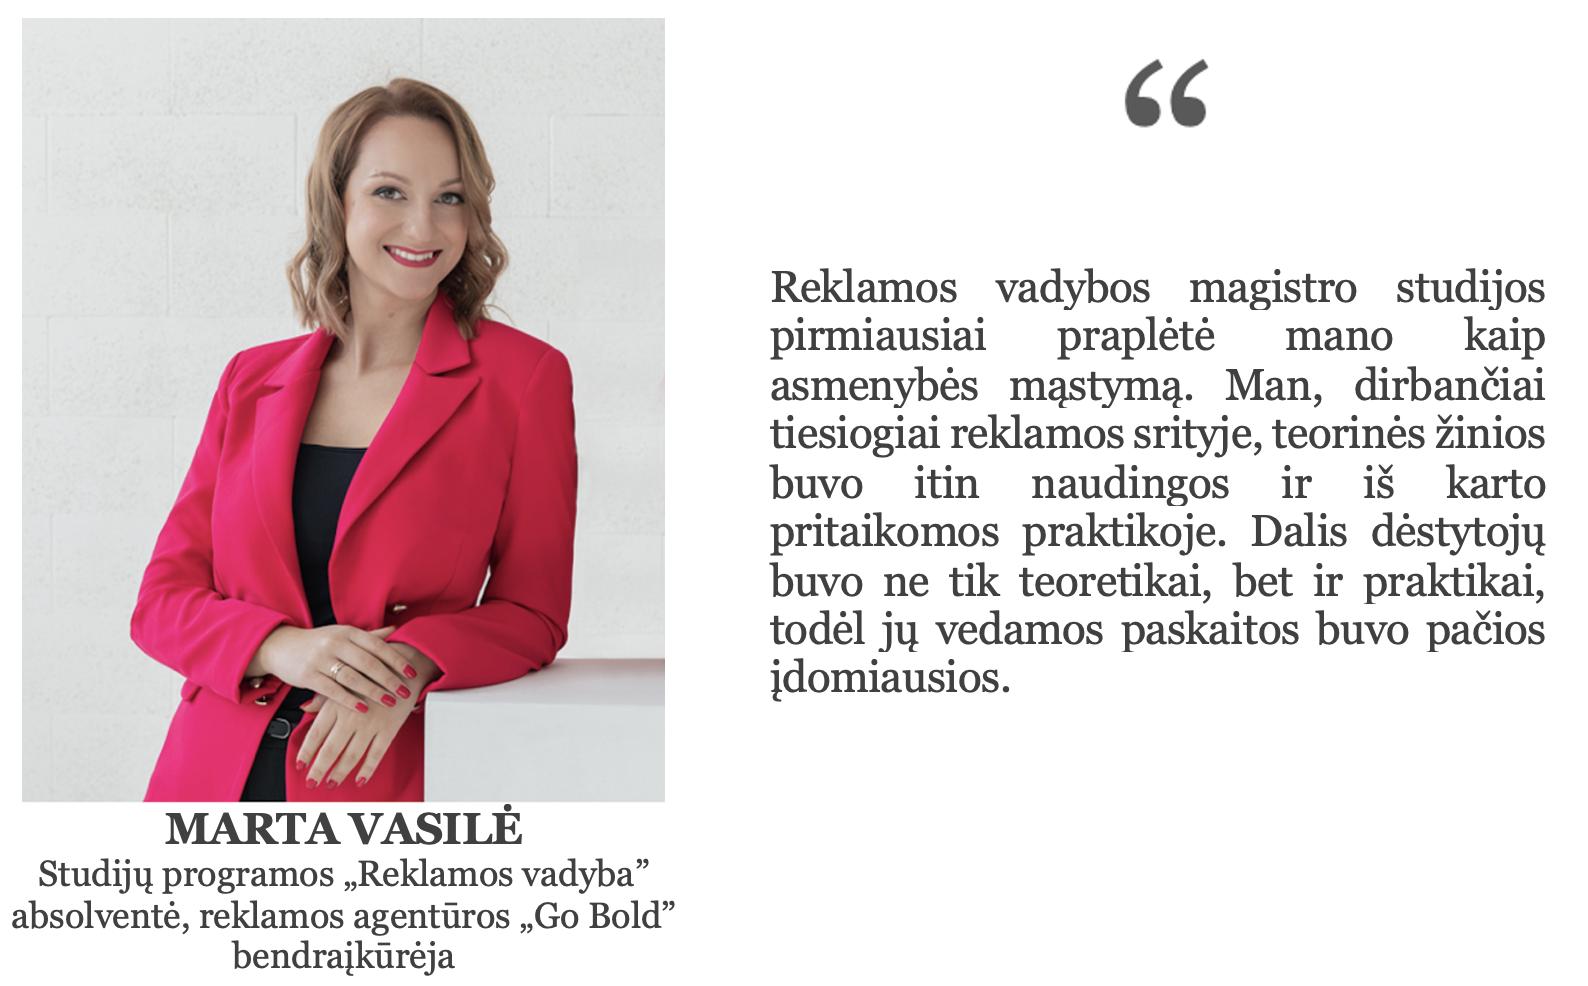 Marta Vasilė